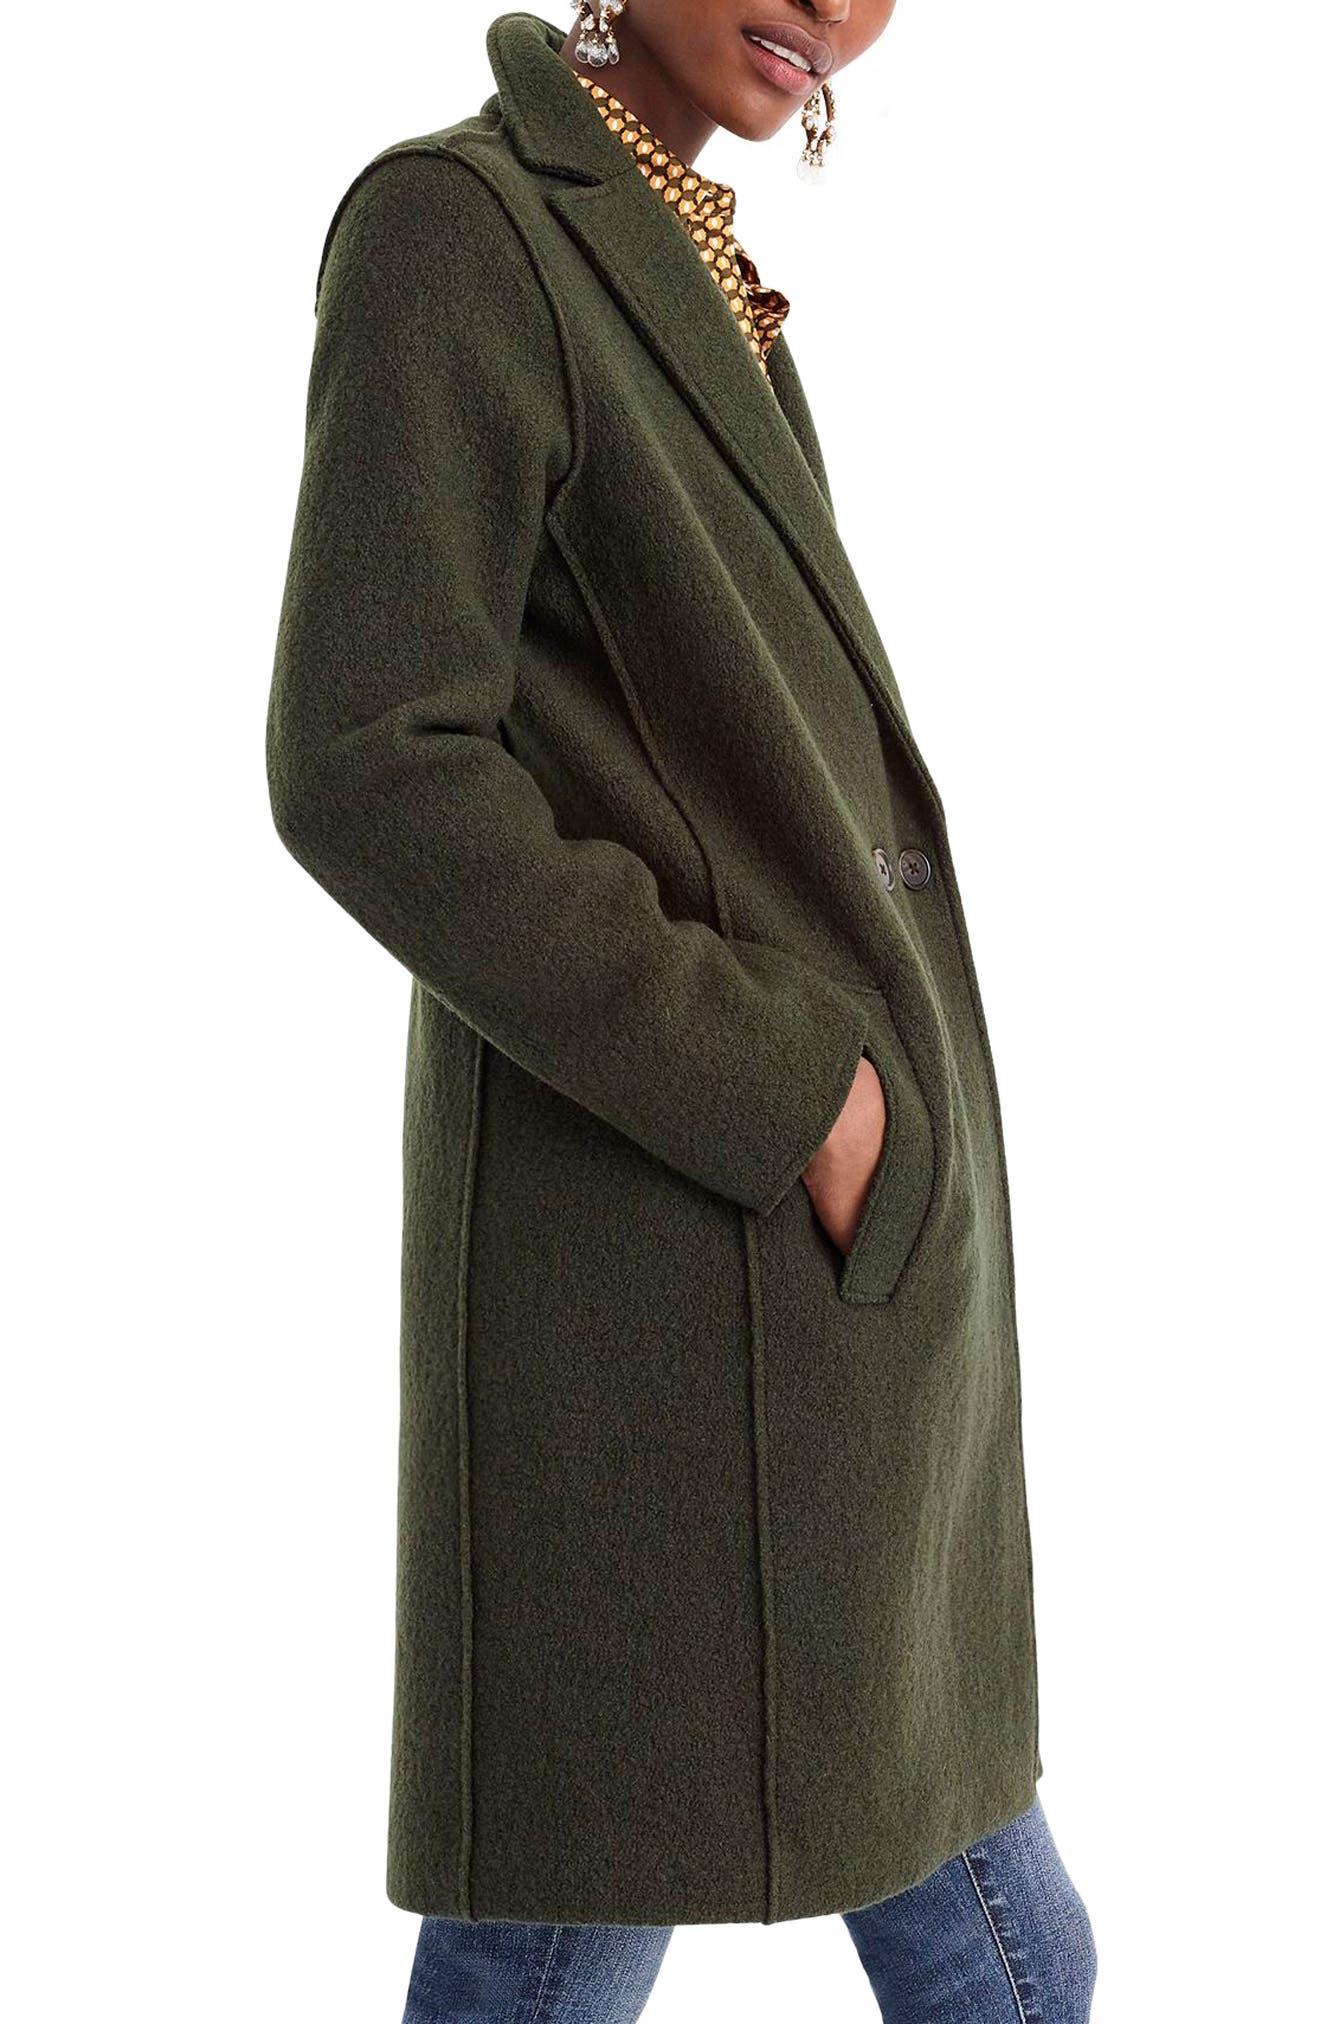 J.CREW,                             Daphne Boiled Wool Topcoat,                             Alternate thumbnail 4, color,                             301